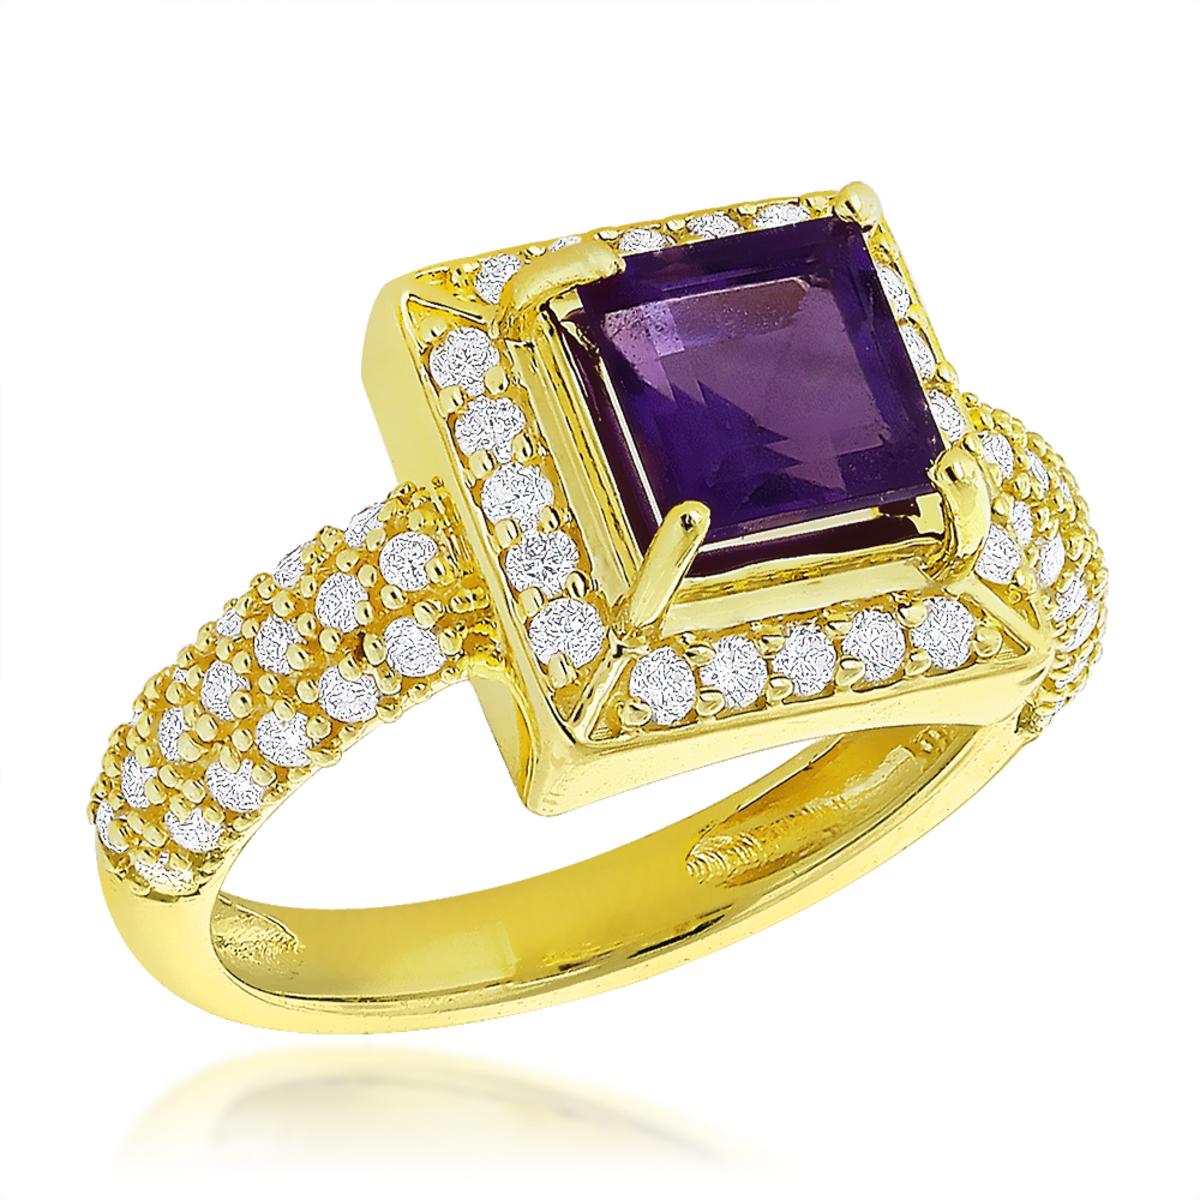 Halo Amethyst Diamond Engagement Ring 0.68ct 14K Gold Gemstone Ring